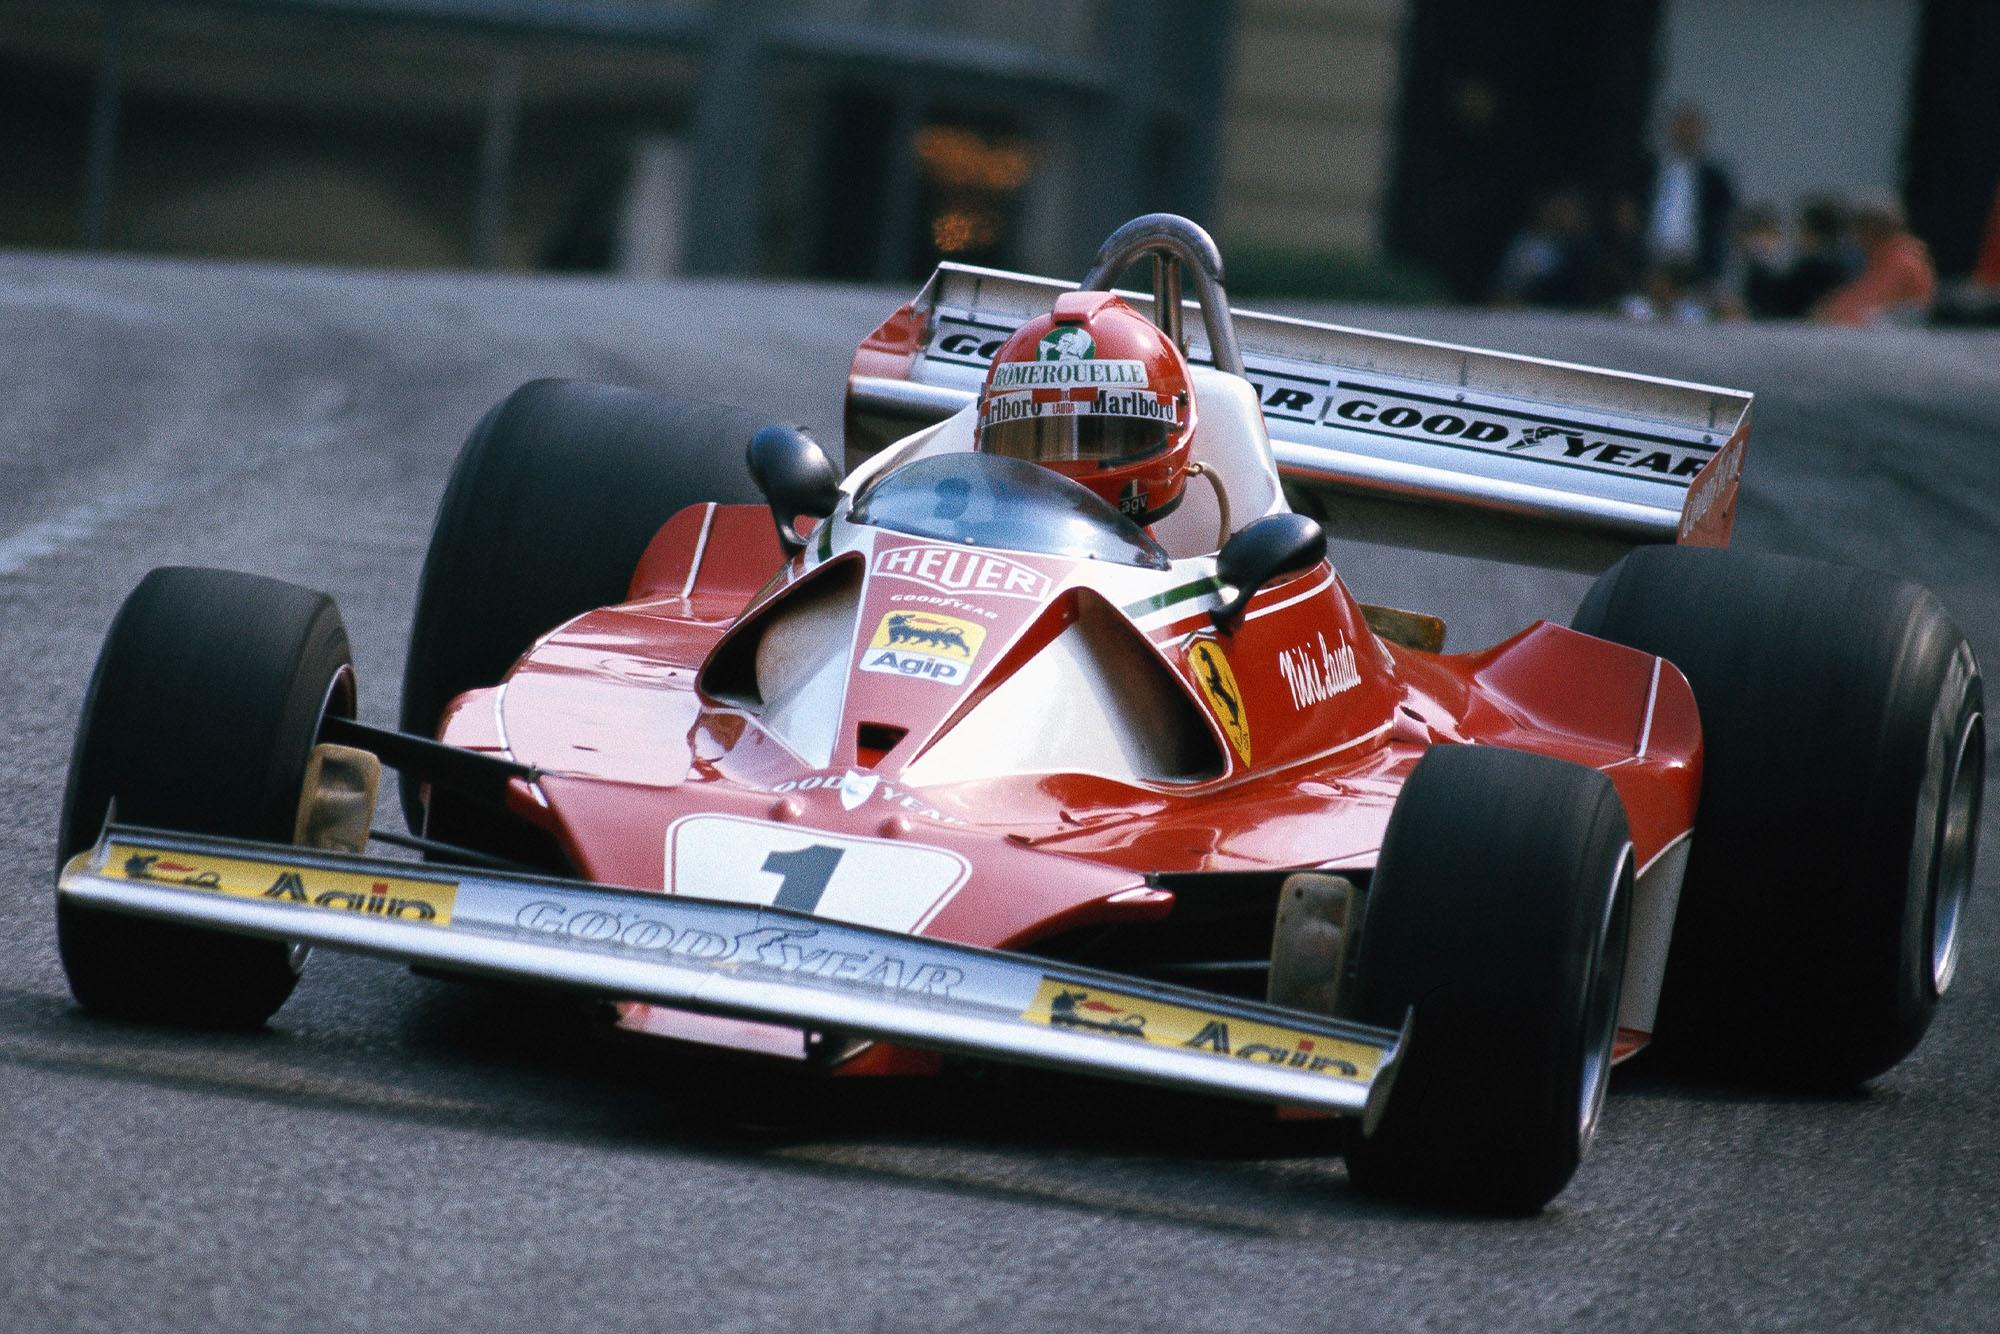 Niki Lauda (Ferrari) at the 1976 Monaco Grand Prix.